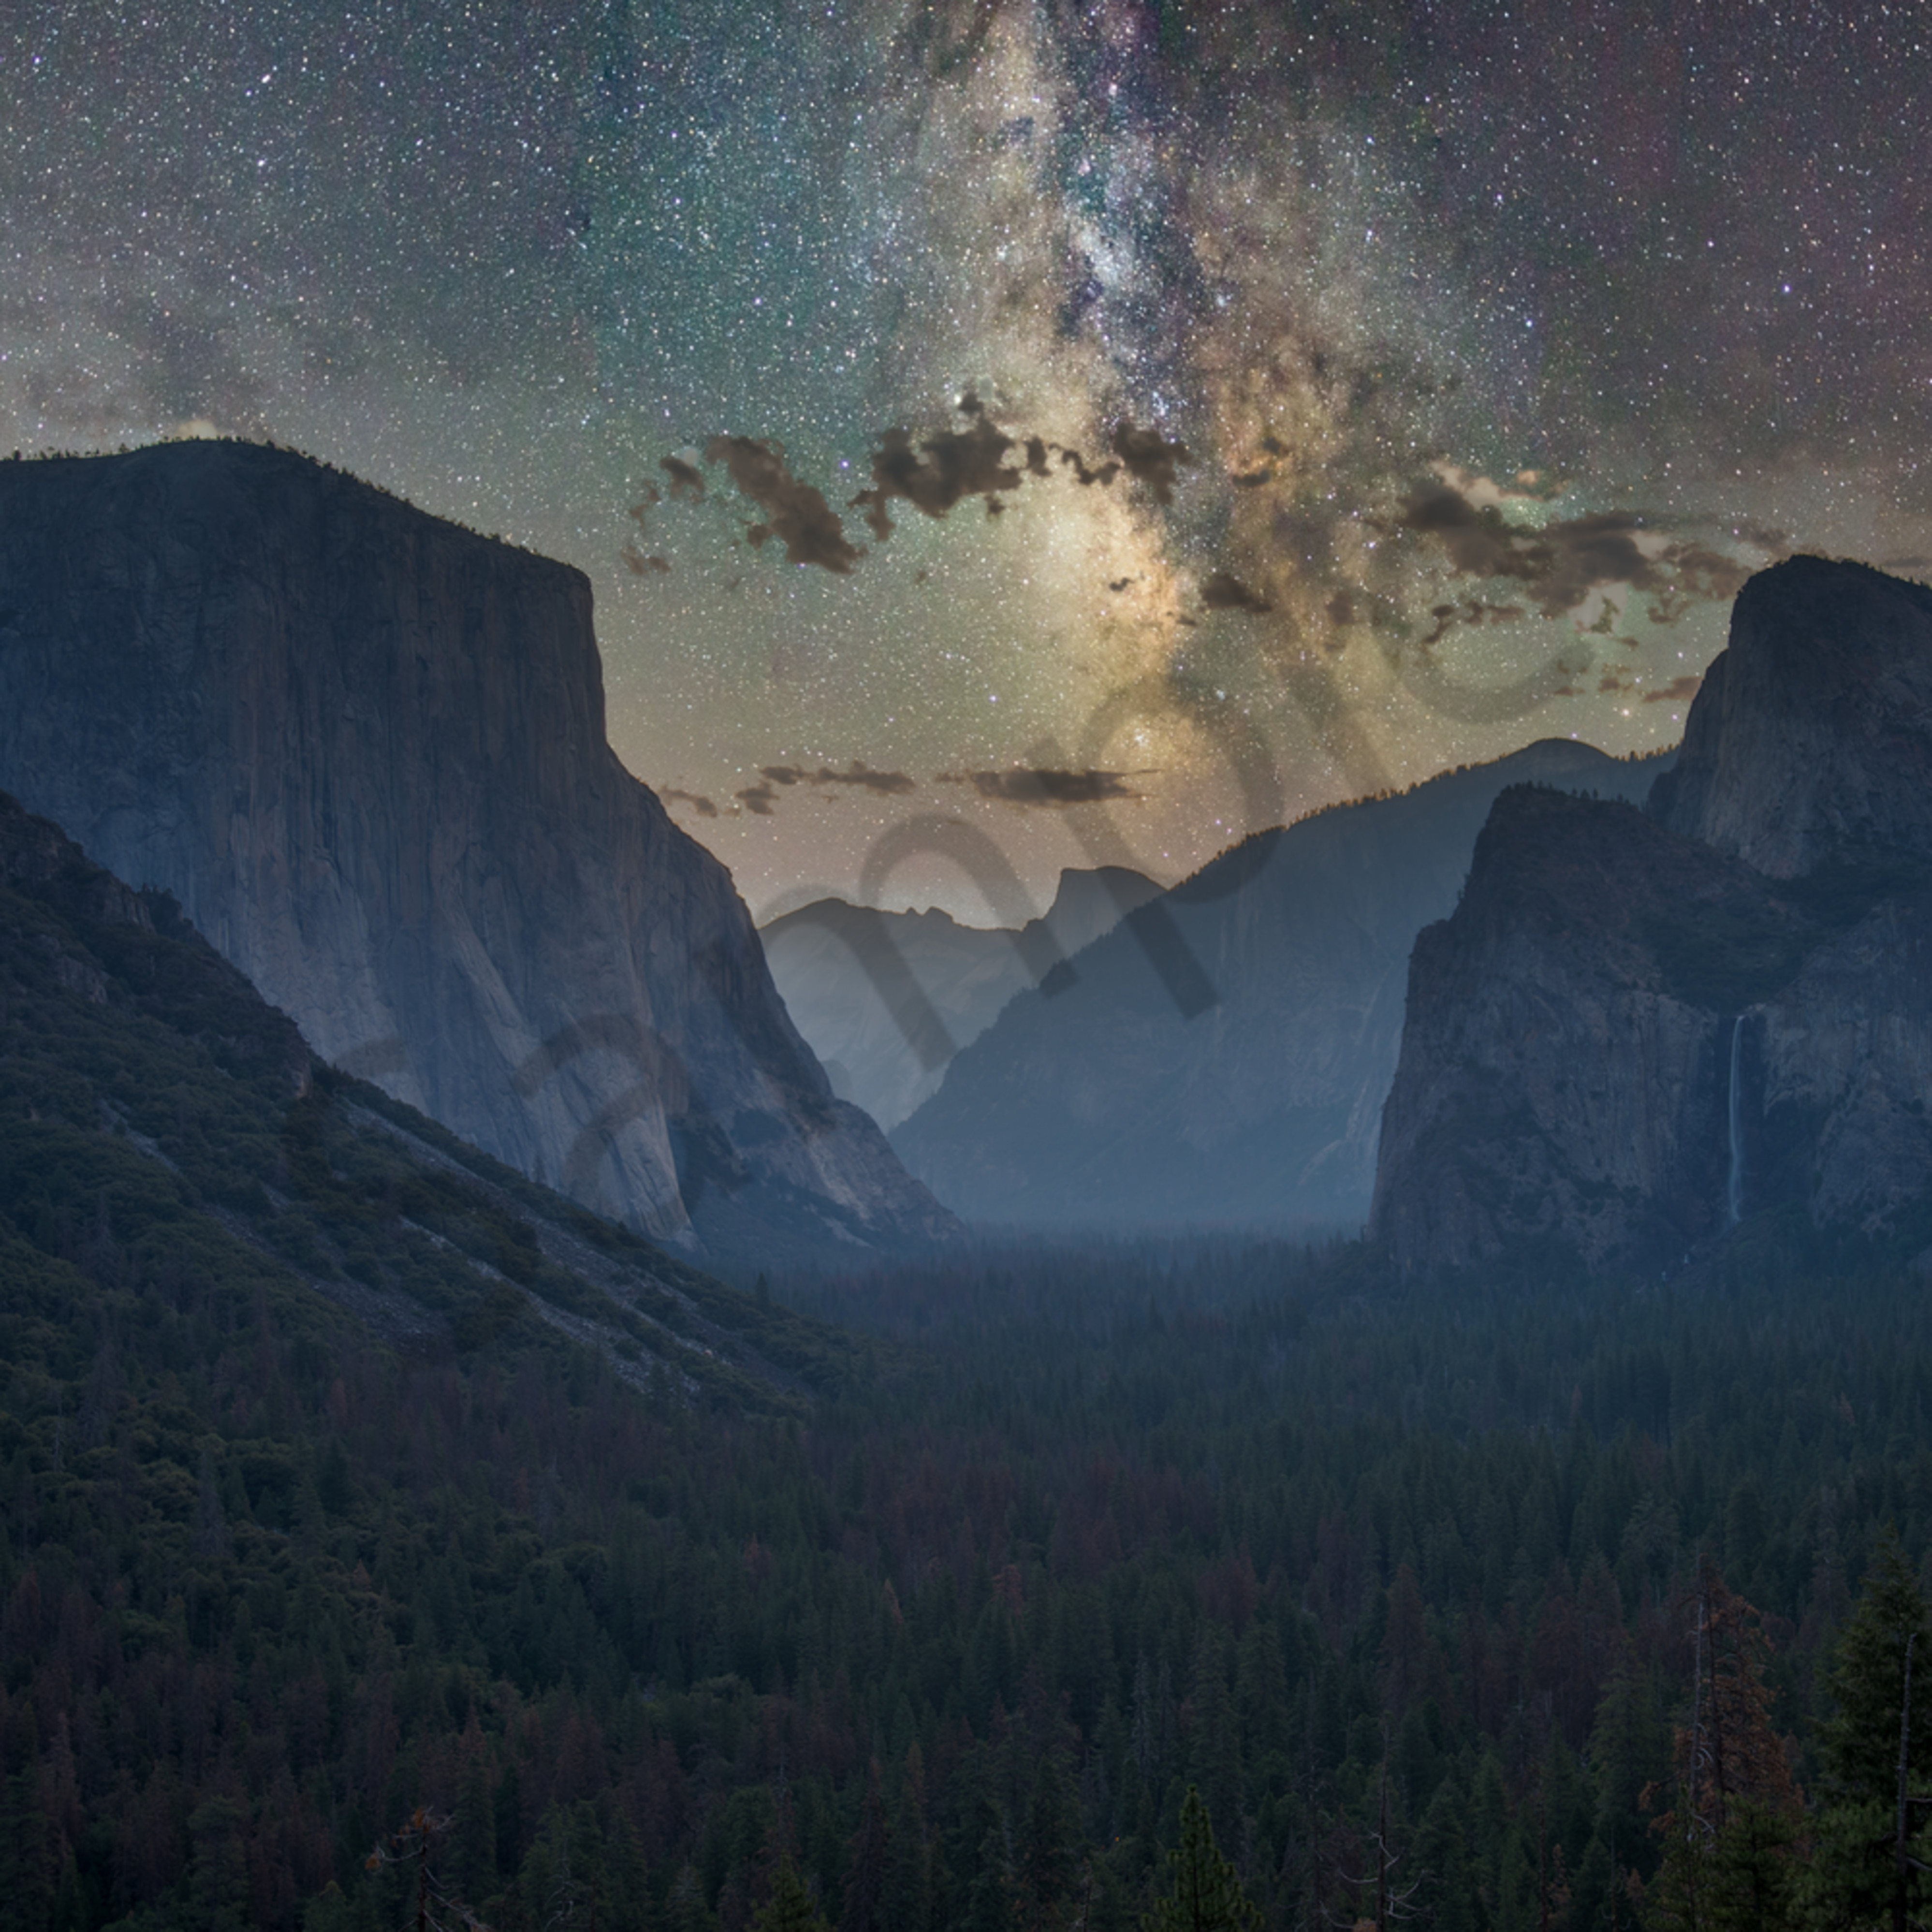 Yosemite valley starry night hdr luminar4 edit vftukz